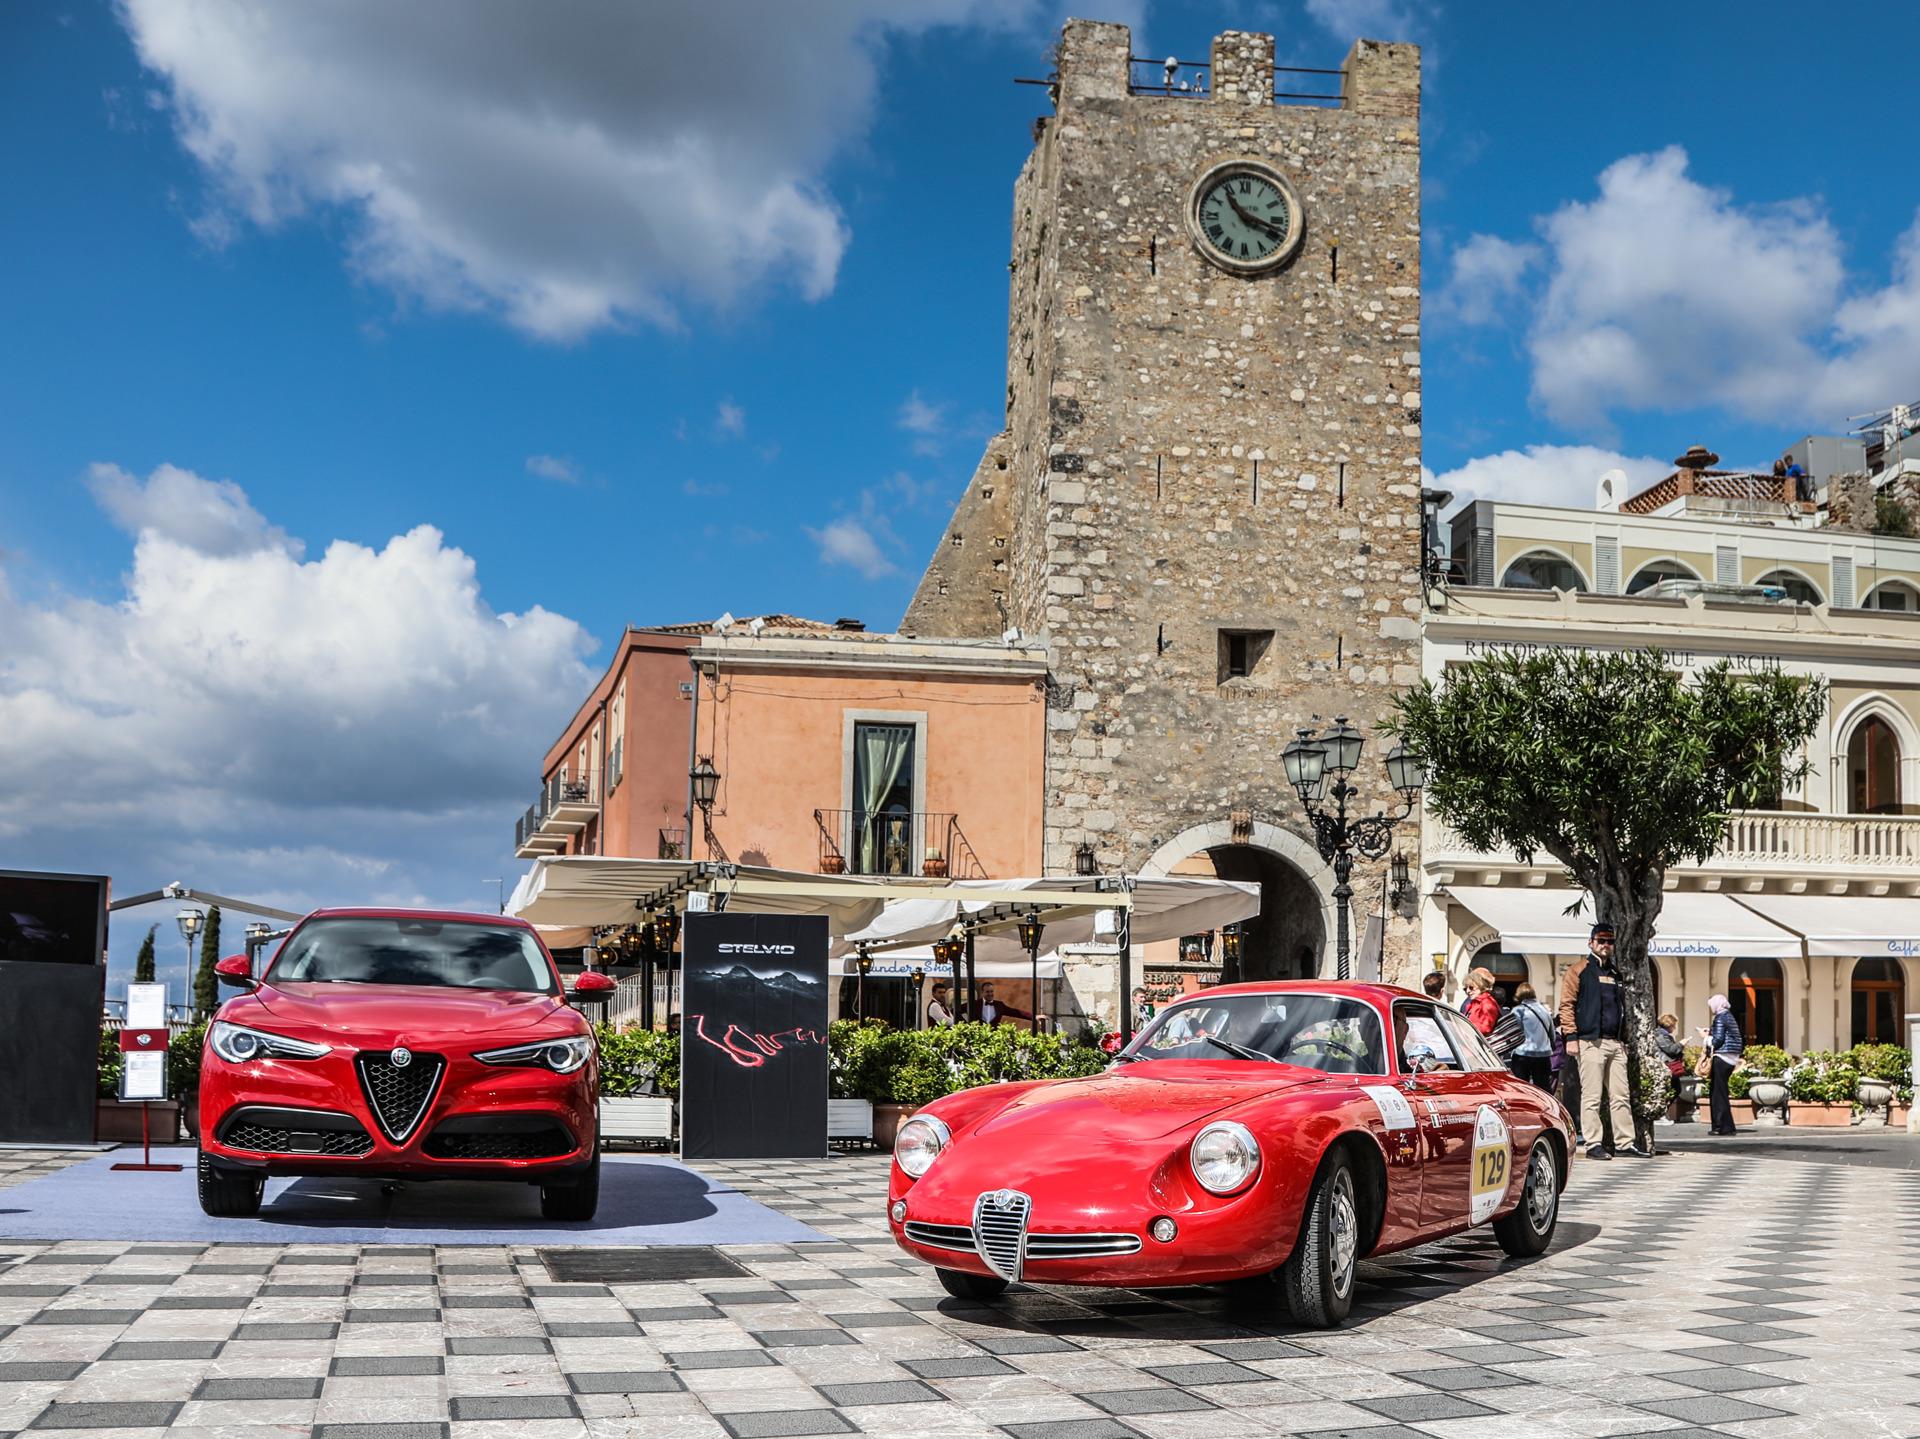 170422_Alfa-Romeo_On-Air_02.jpg